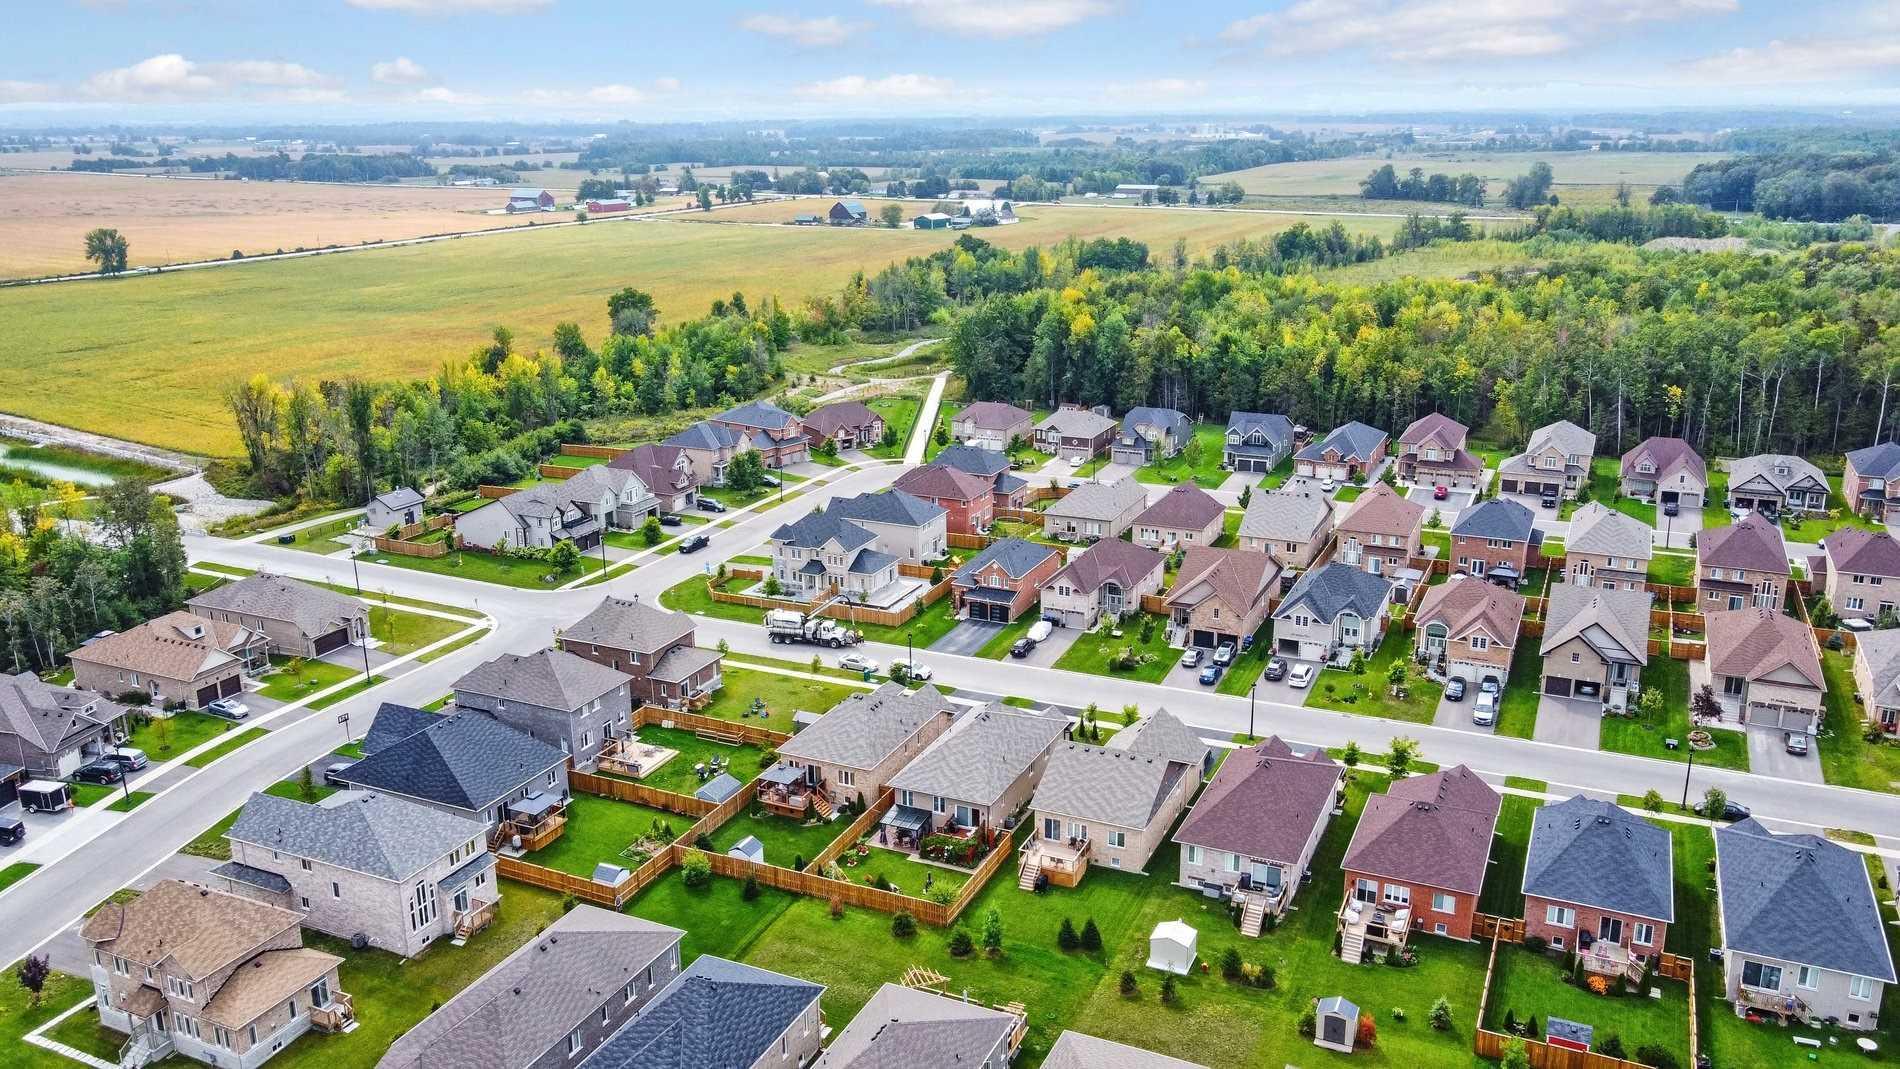 Detached house For Sale In Wasaga Beach - 33 Middleton Dr, Wasaga Beach, Ontario, Canada L9Z0G8 , 2 Bedrooms Bedrooms, ,3 BathroomsBathrooms,Detached,For Sale,Middleton